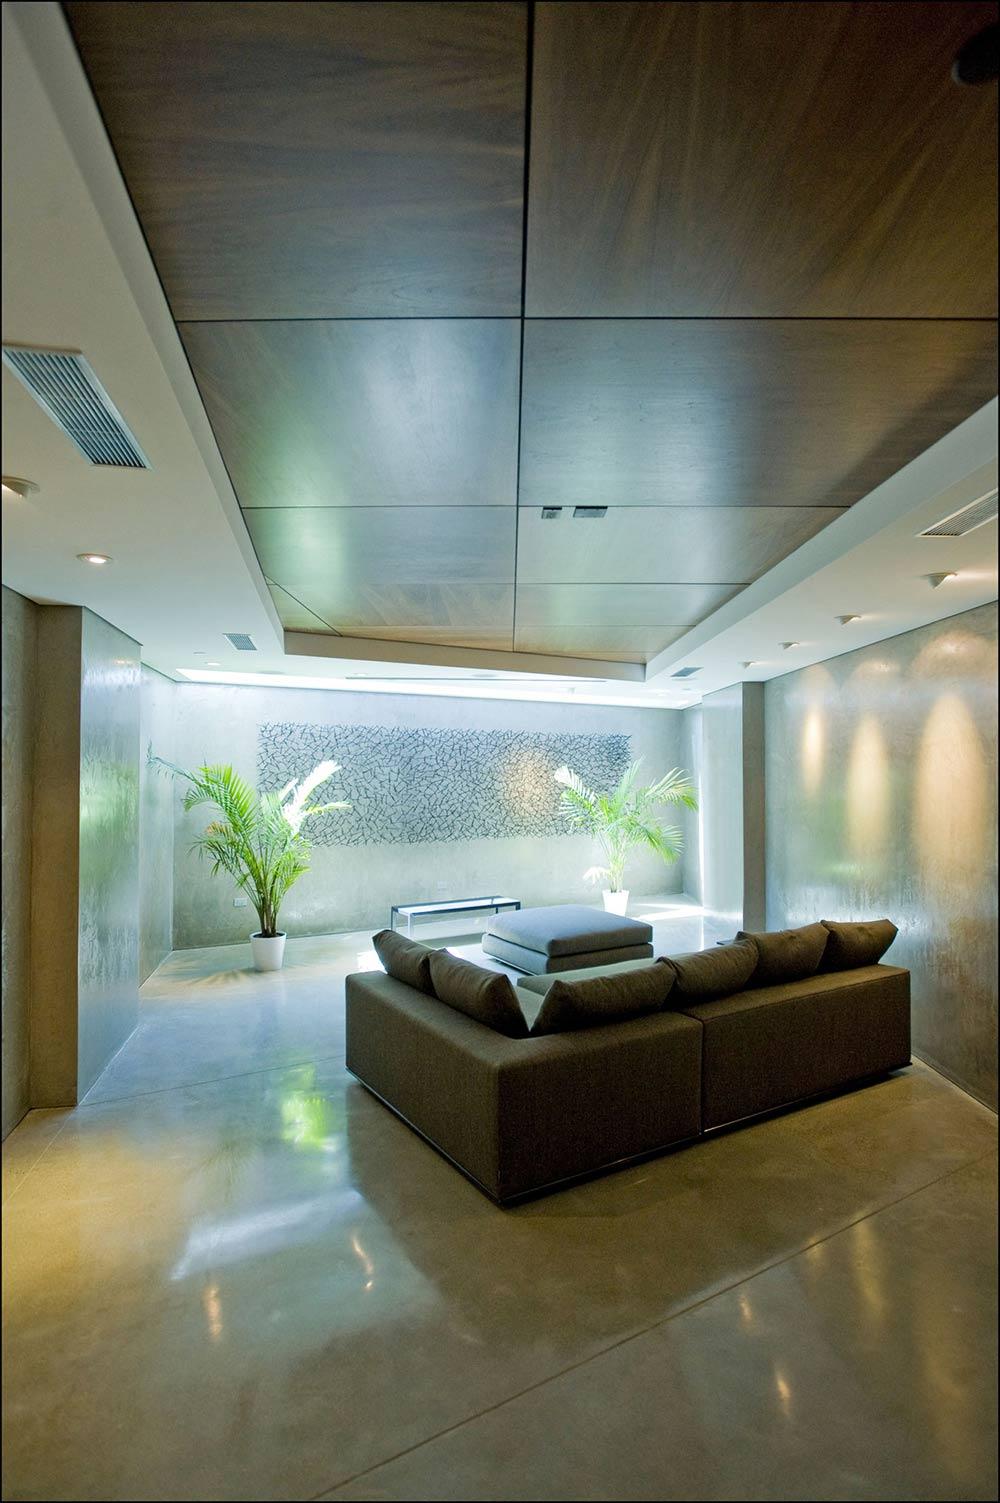 Living Space, Exquisite Ocean Front Residence in La Jolla, California